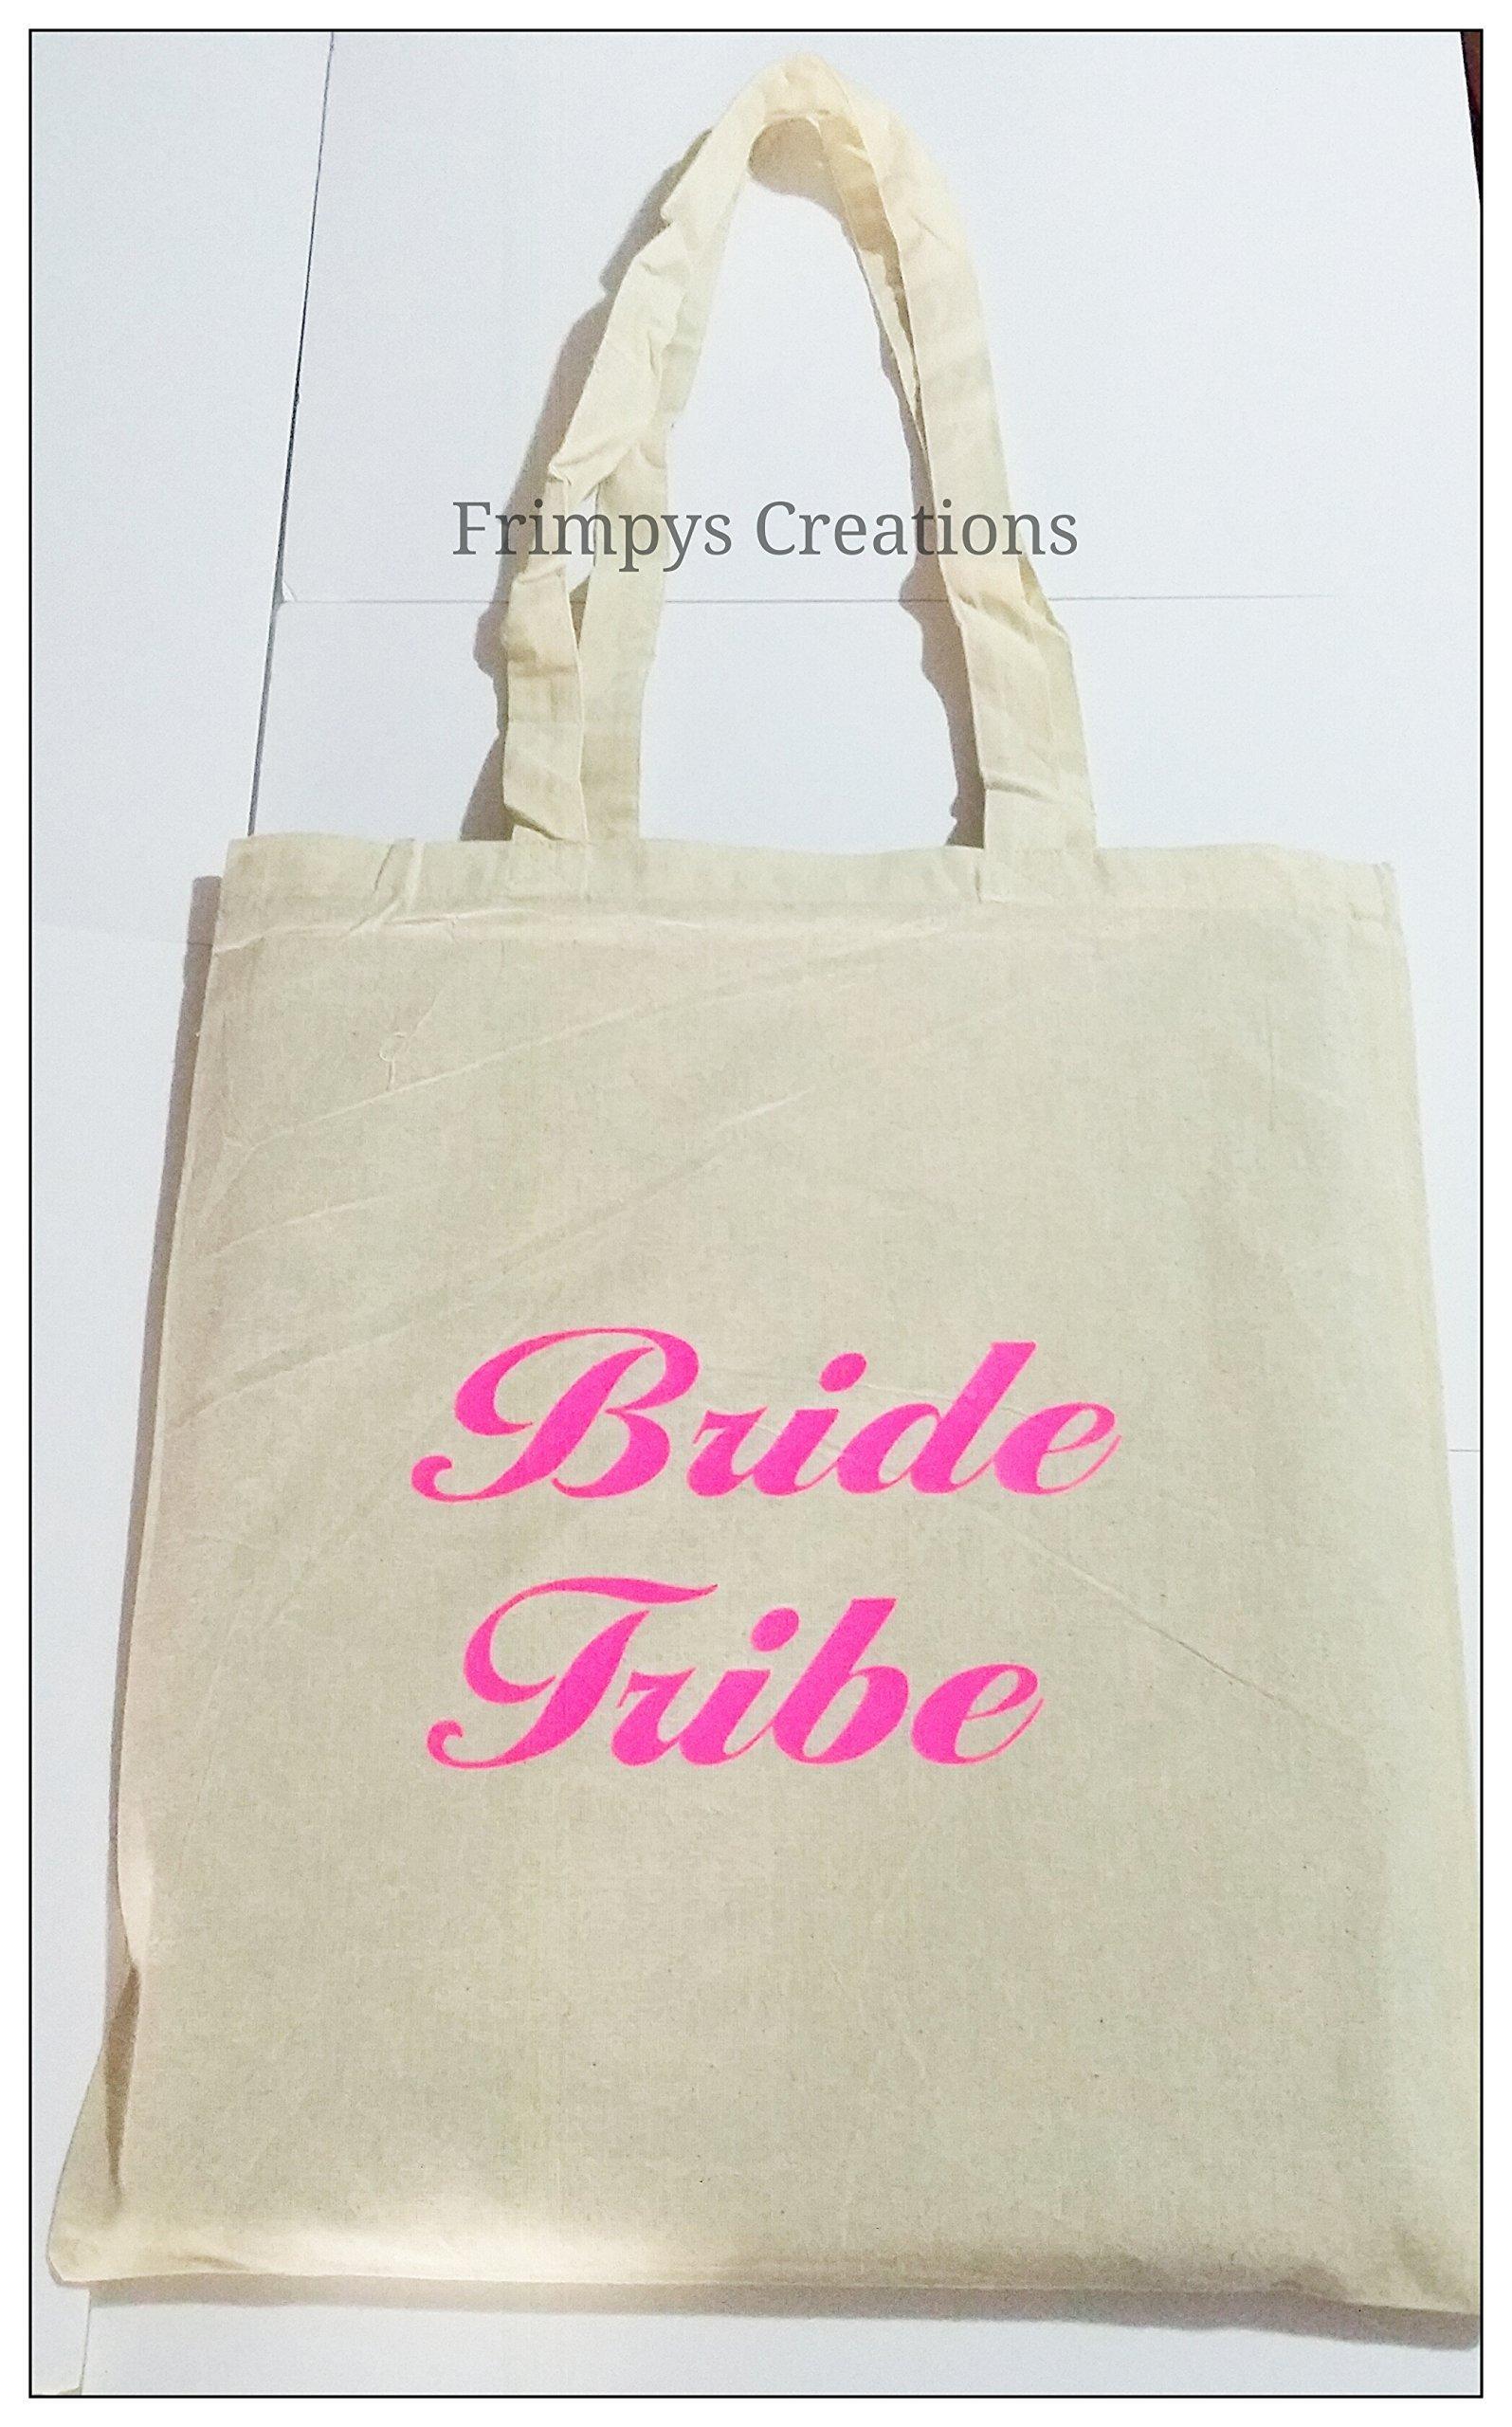 Wedding Favour Tote Bag cotton Printed Gift Present Keep Bride Tribe Novelty (BAG) - handmade-bags